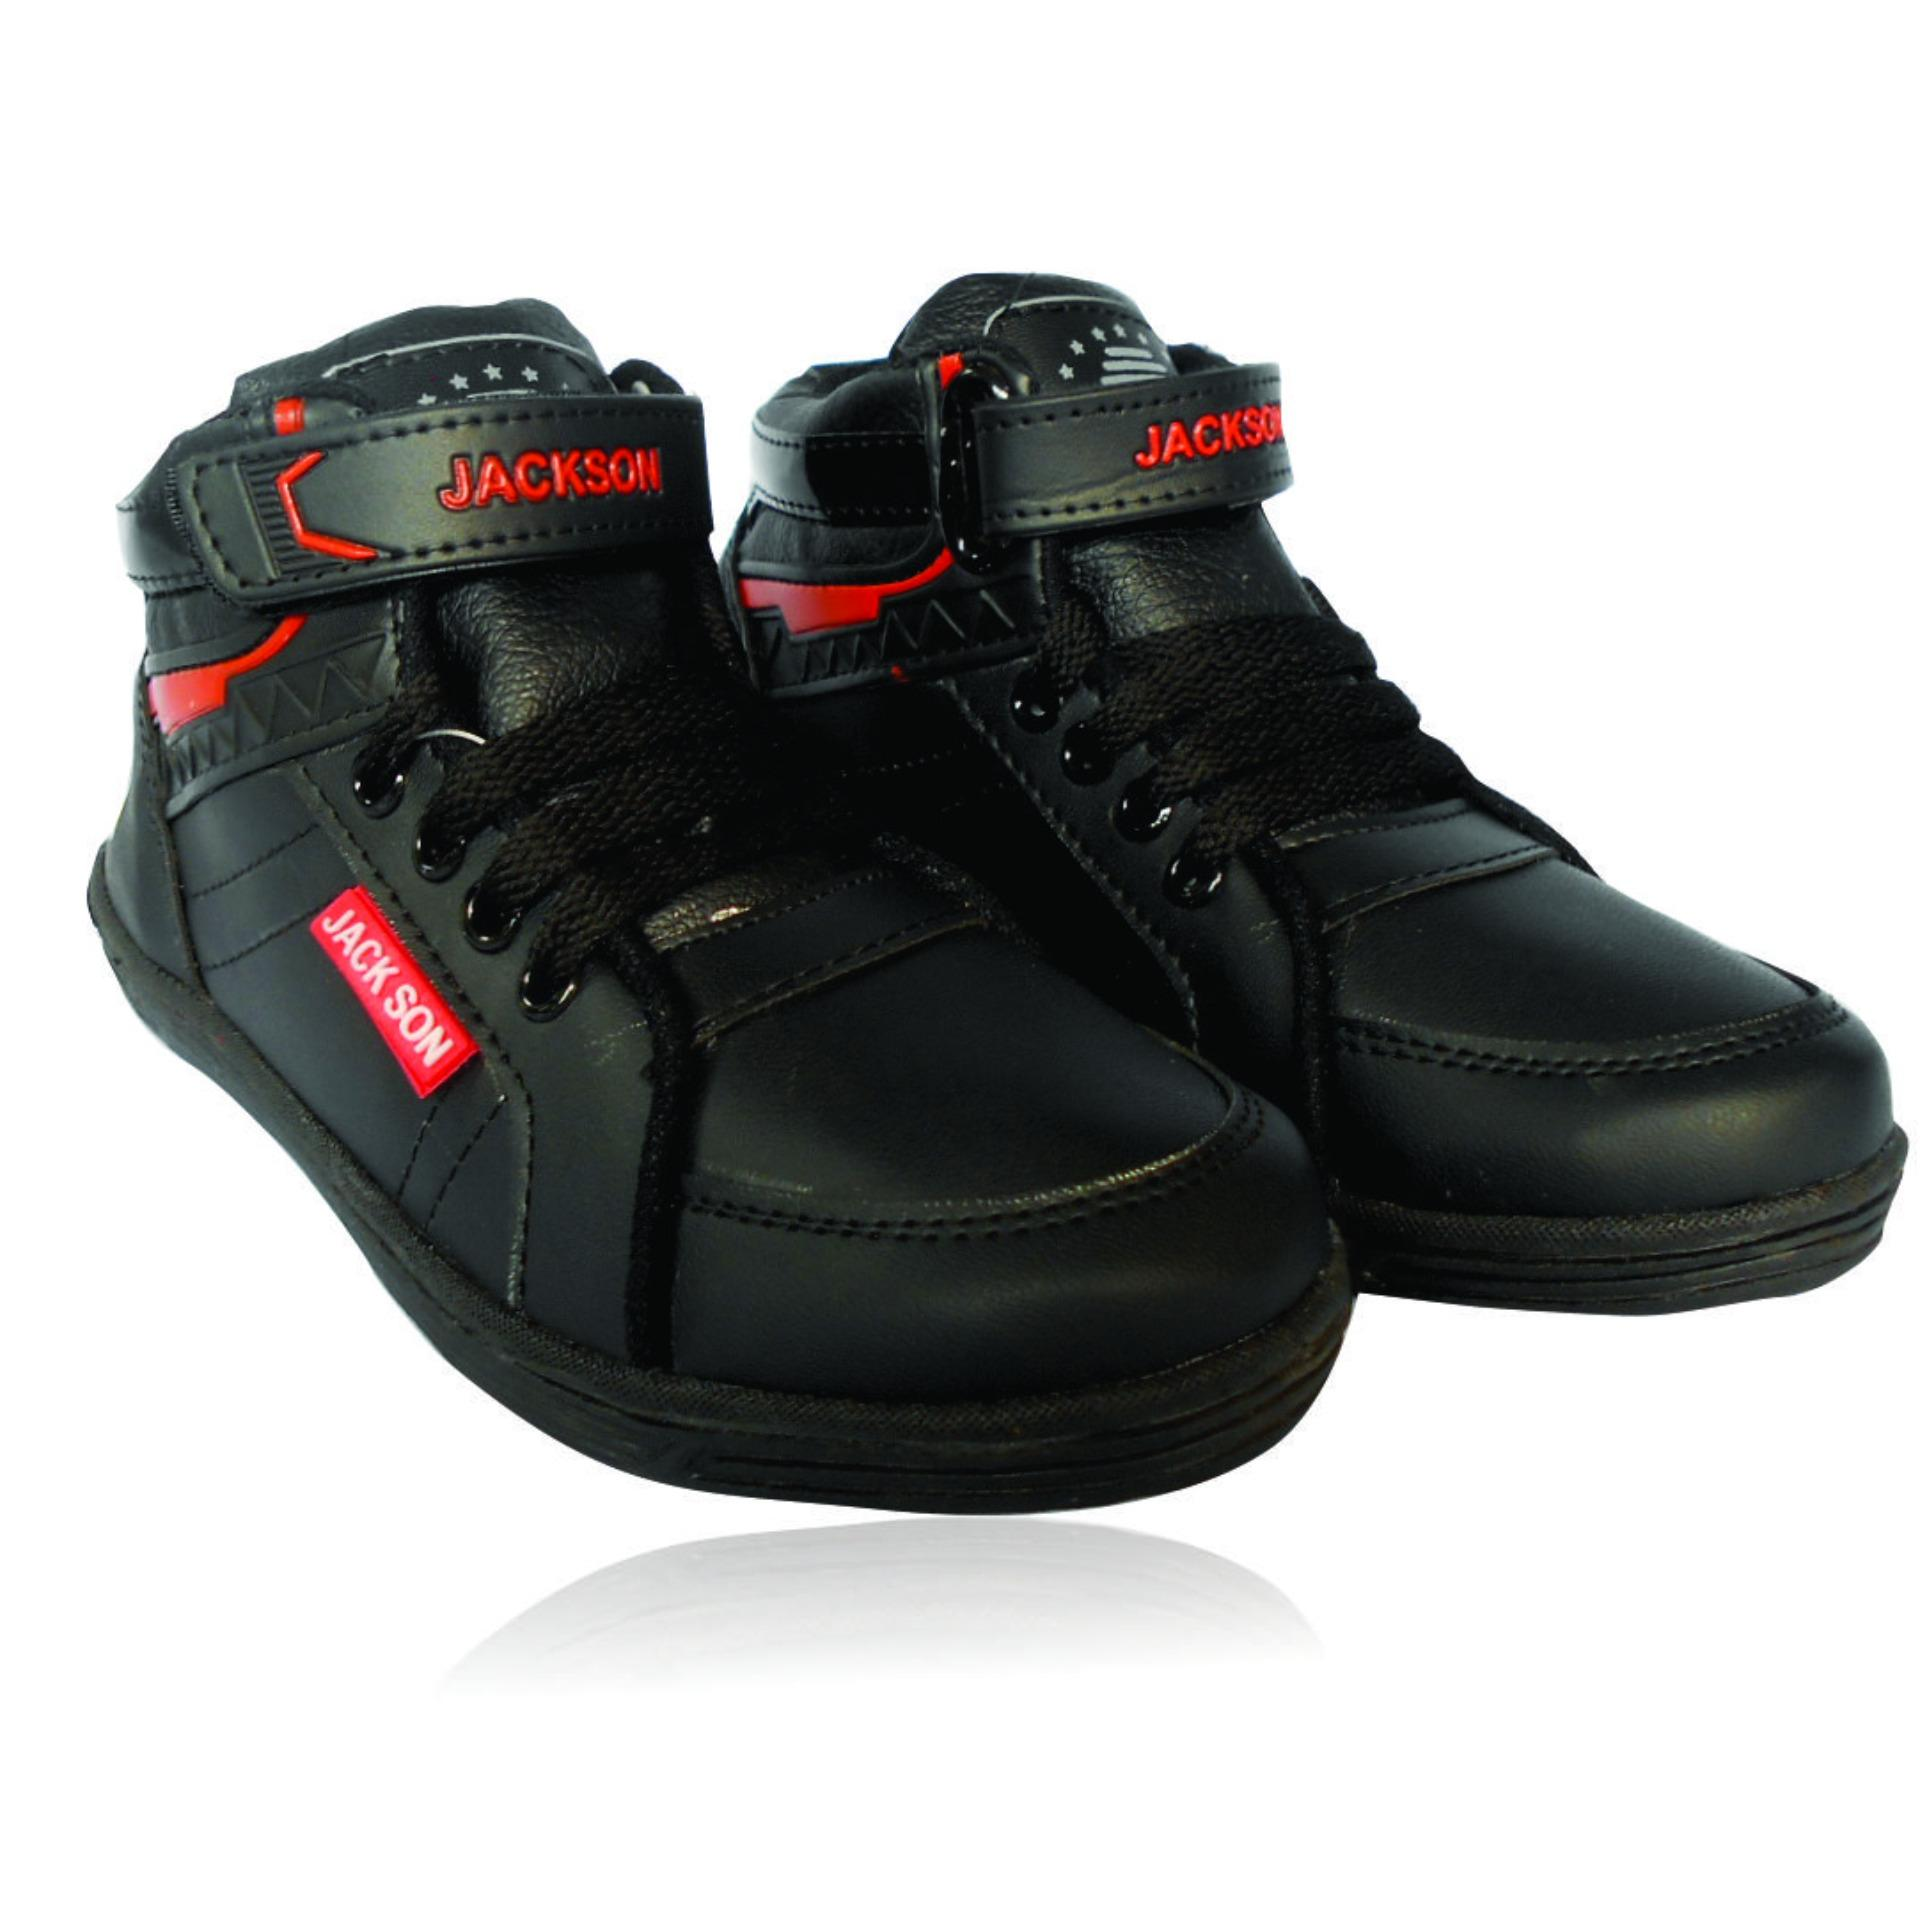 Sepatu Sekolah Anak - Hitam - Model Tali